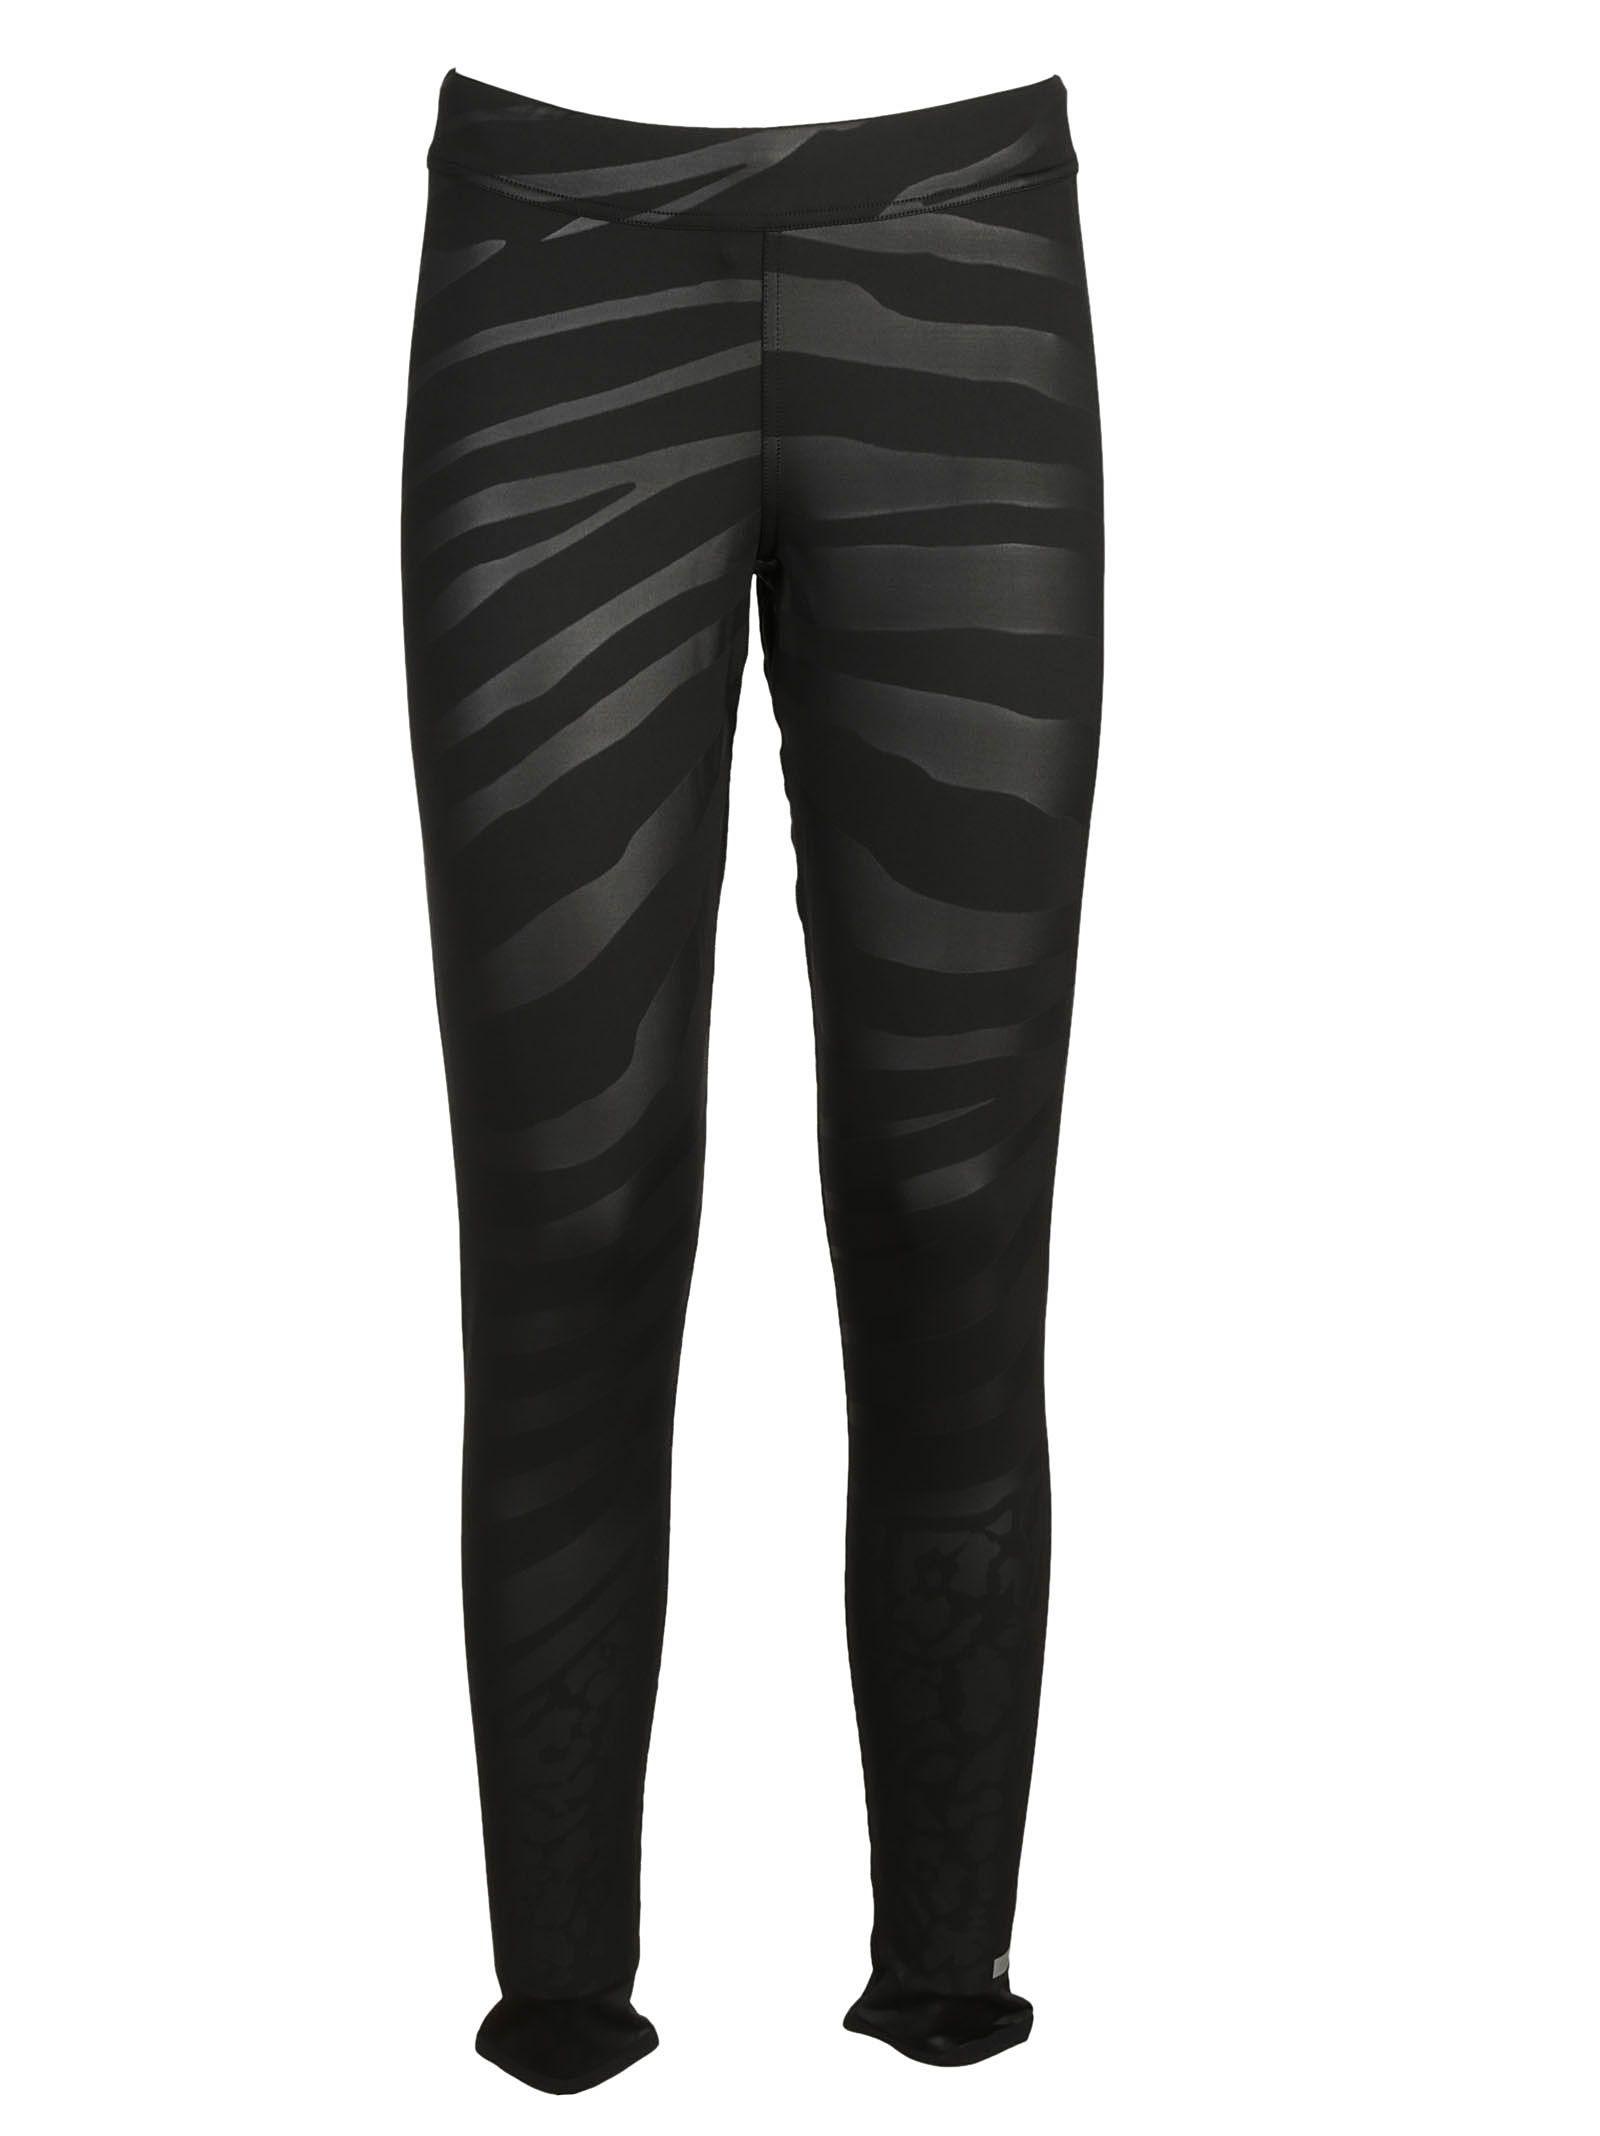 Adidas By Stella McCartney Zebra Print Leggings